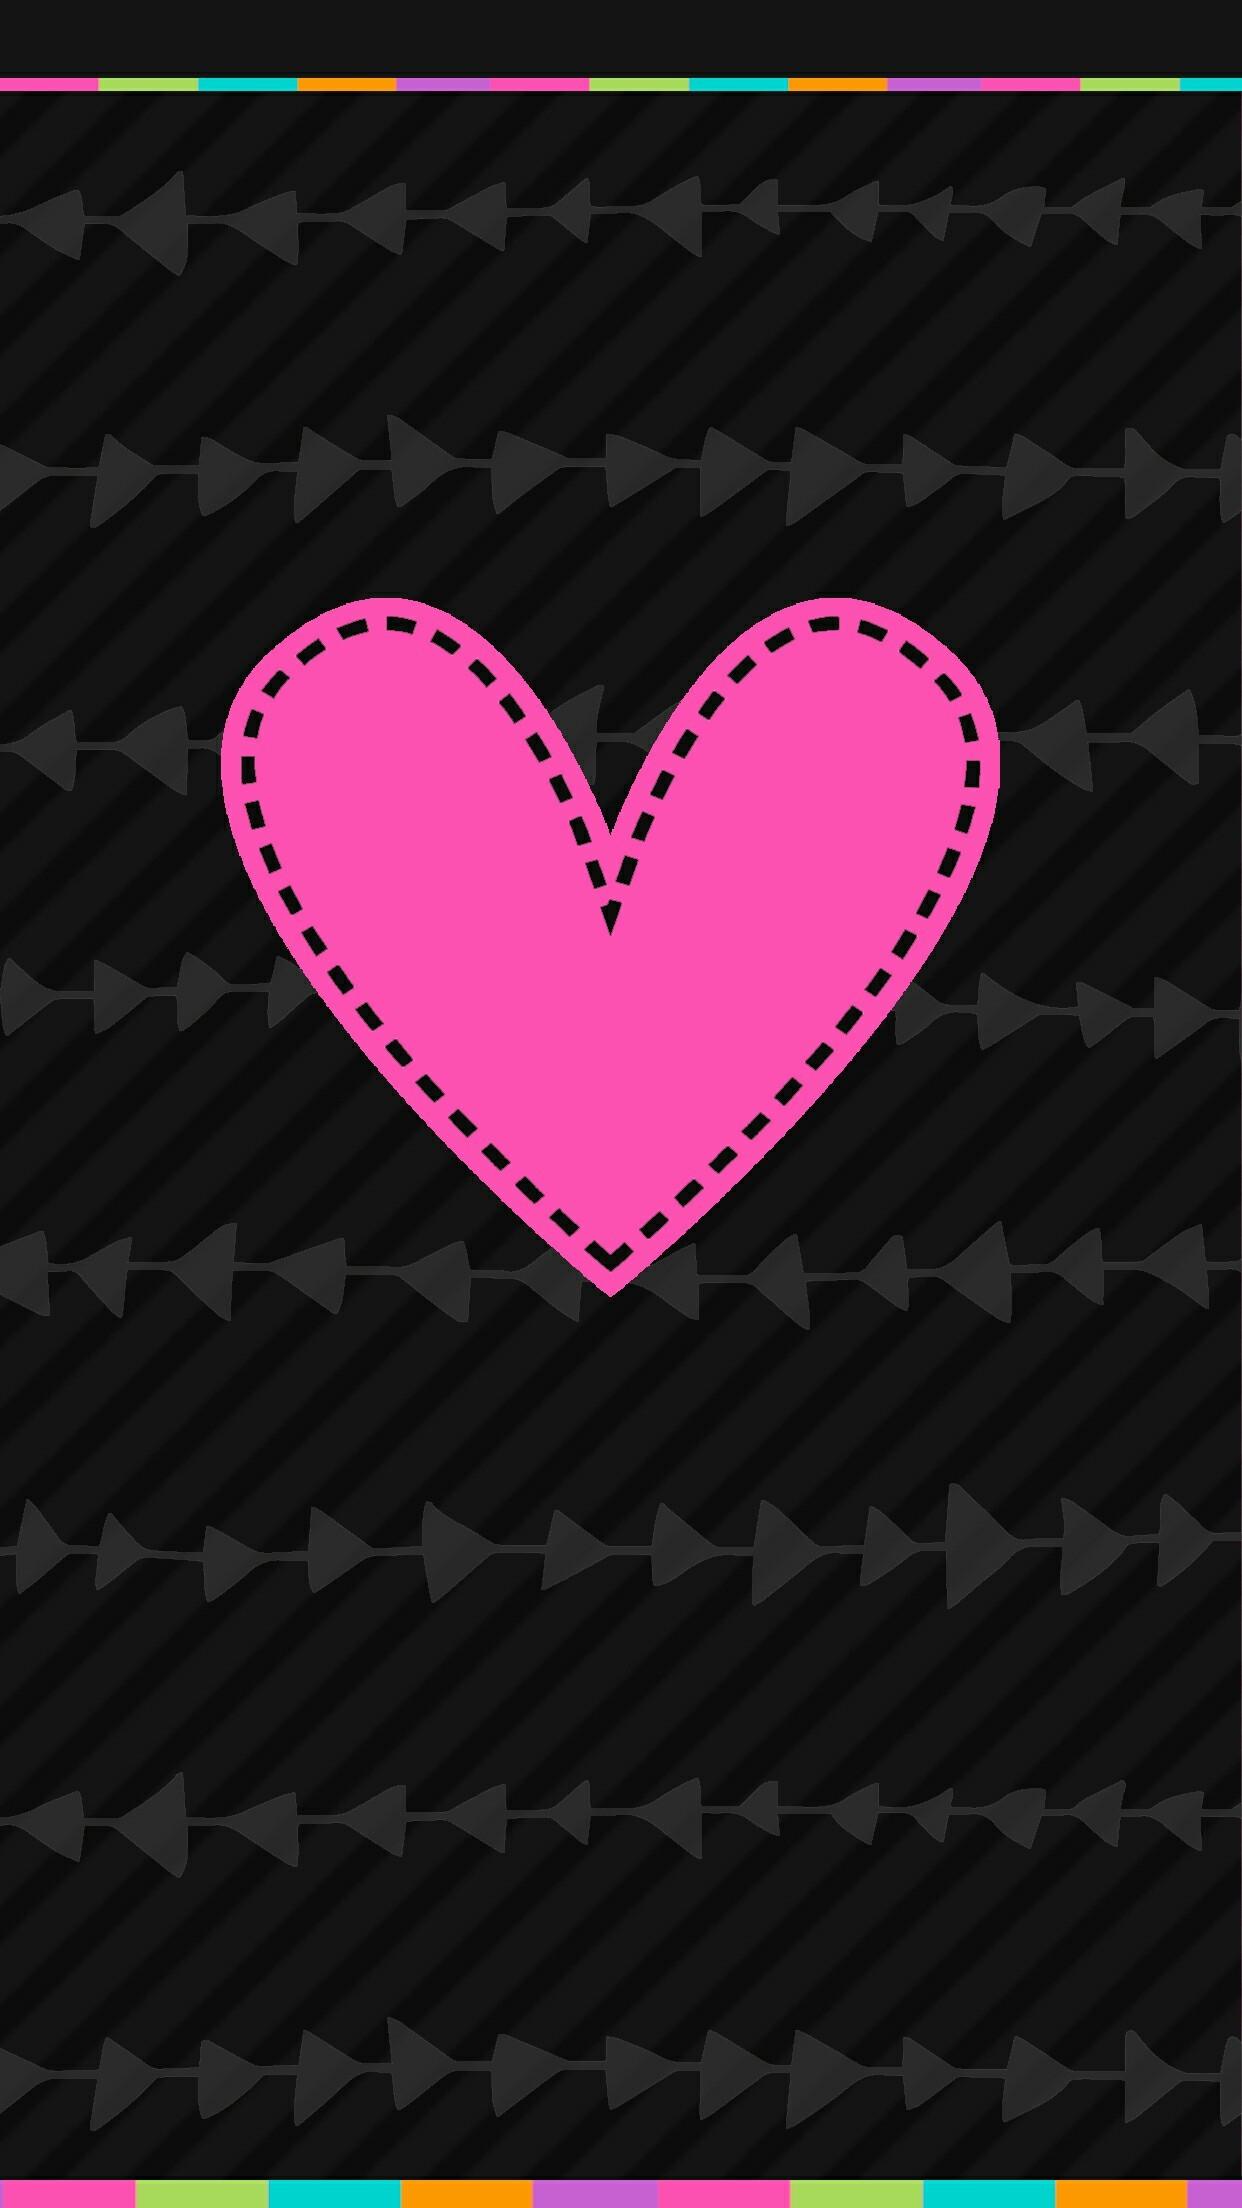 iPhone Wall tjn · Heart WallpaperPink WallpaperWallpaper BackgroundsCute …